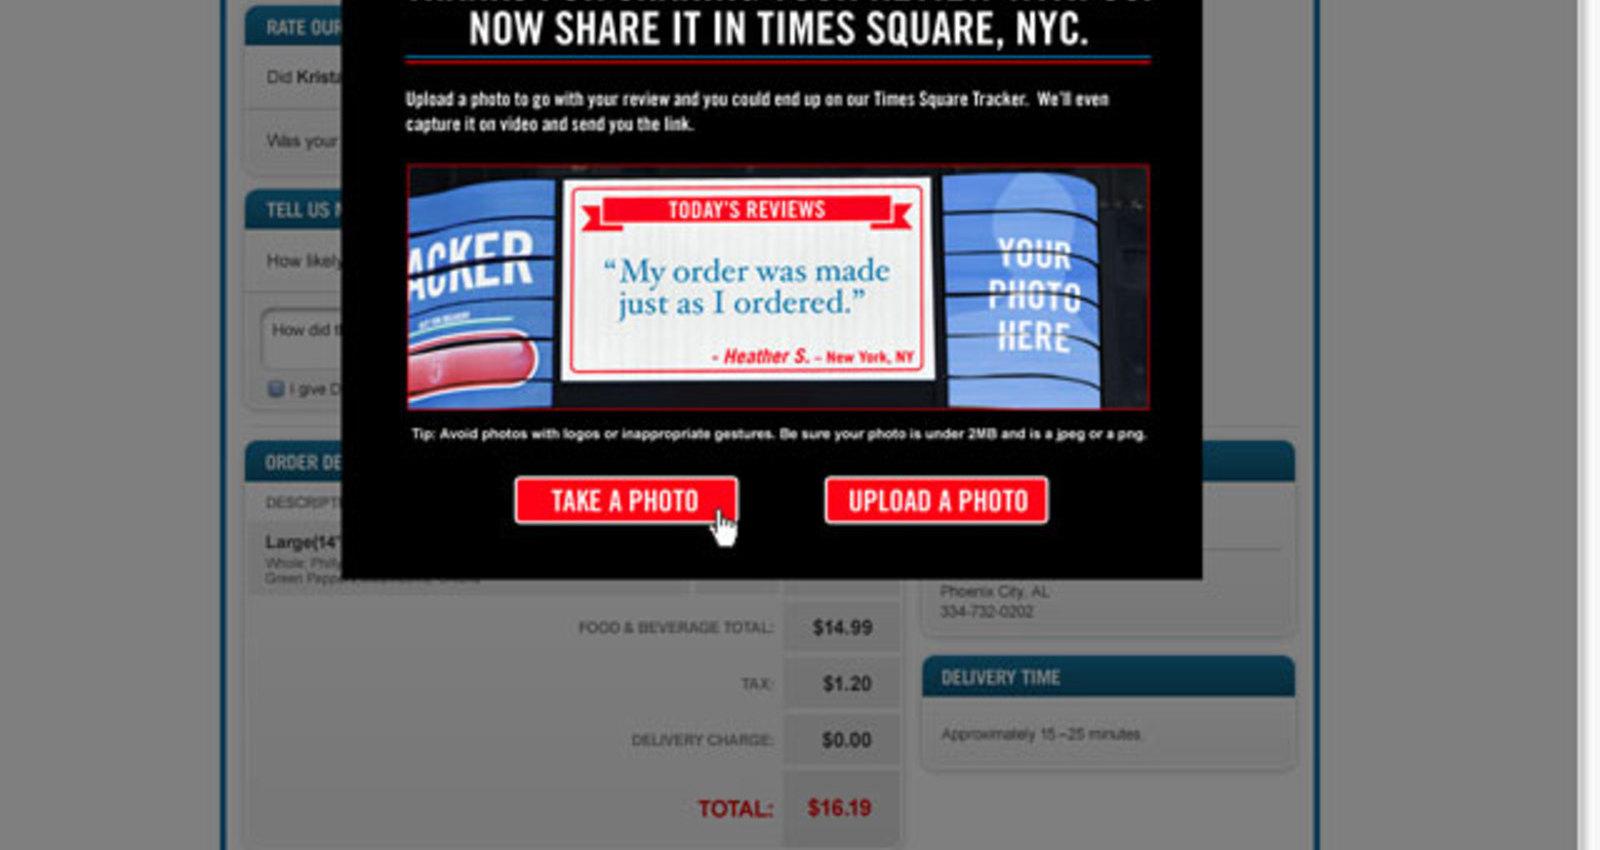 Times Square Tracker